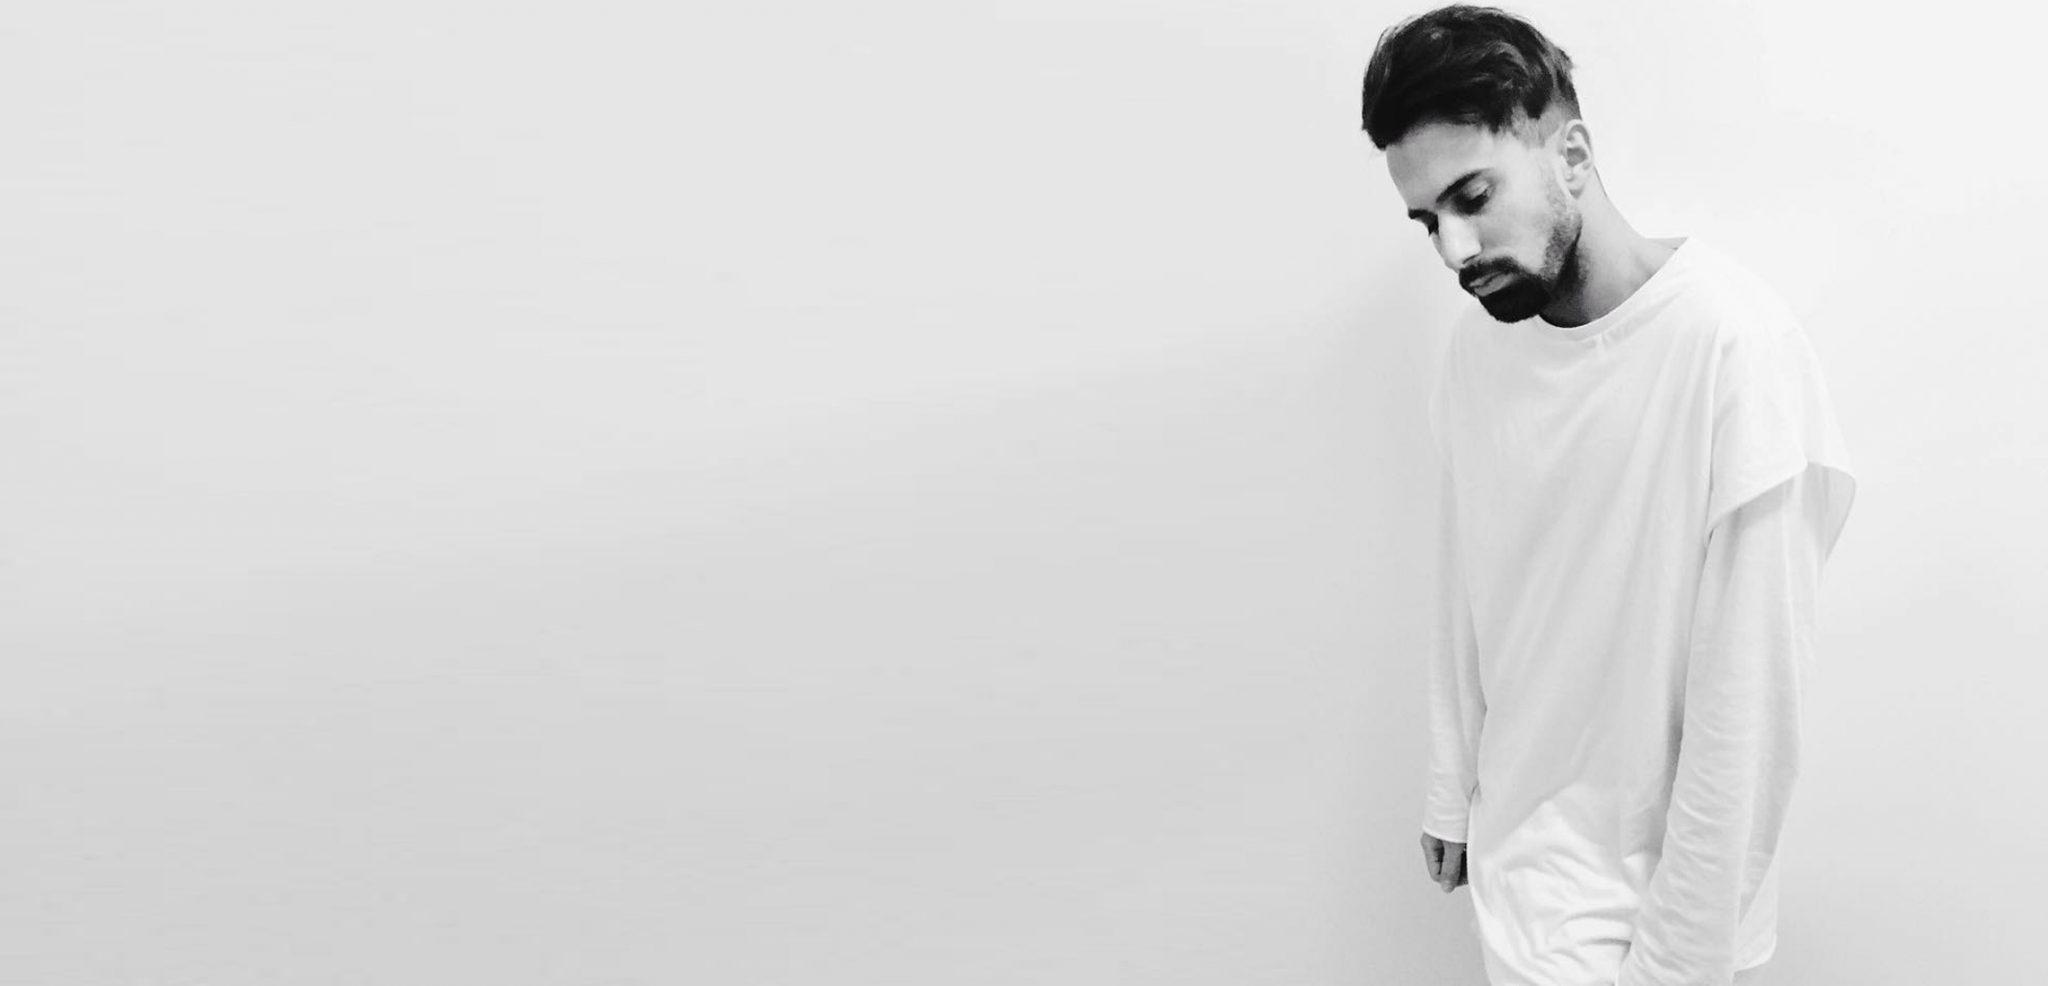 Federico Ambrosi - Sound Off EP hero